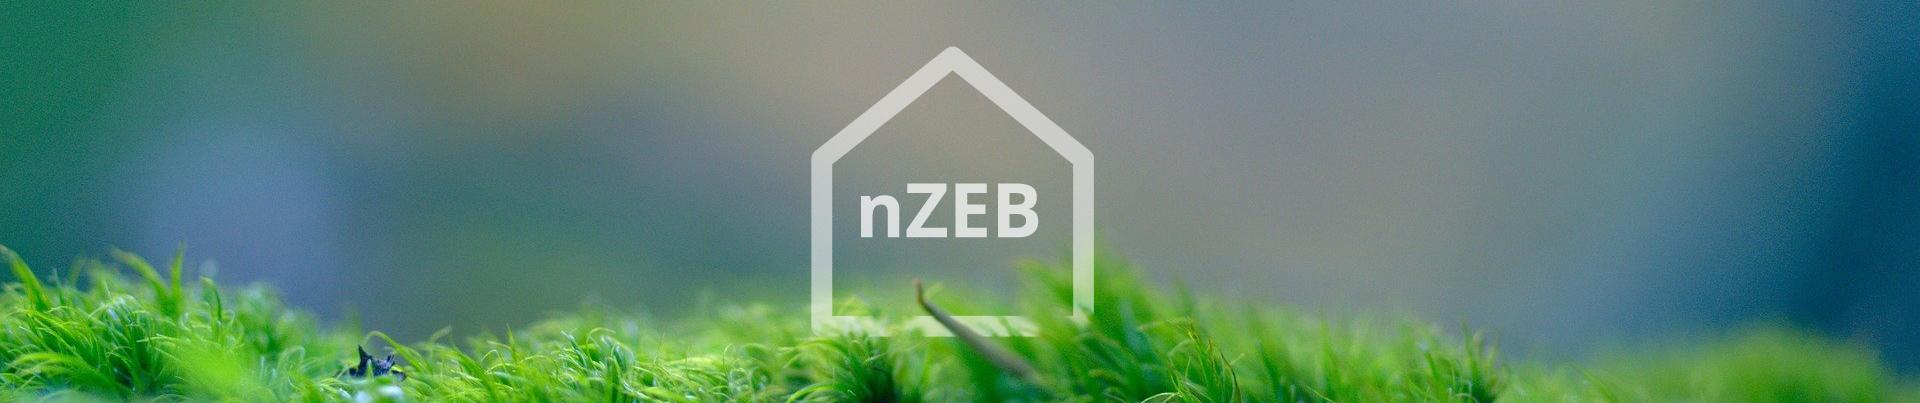 casa-nzeb